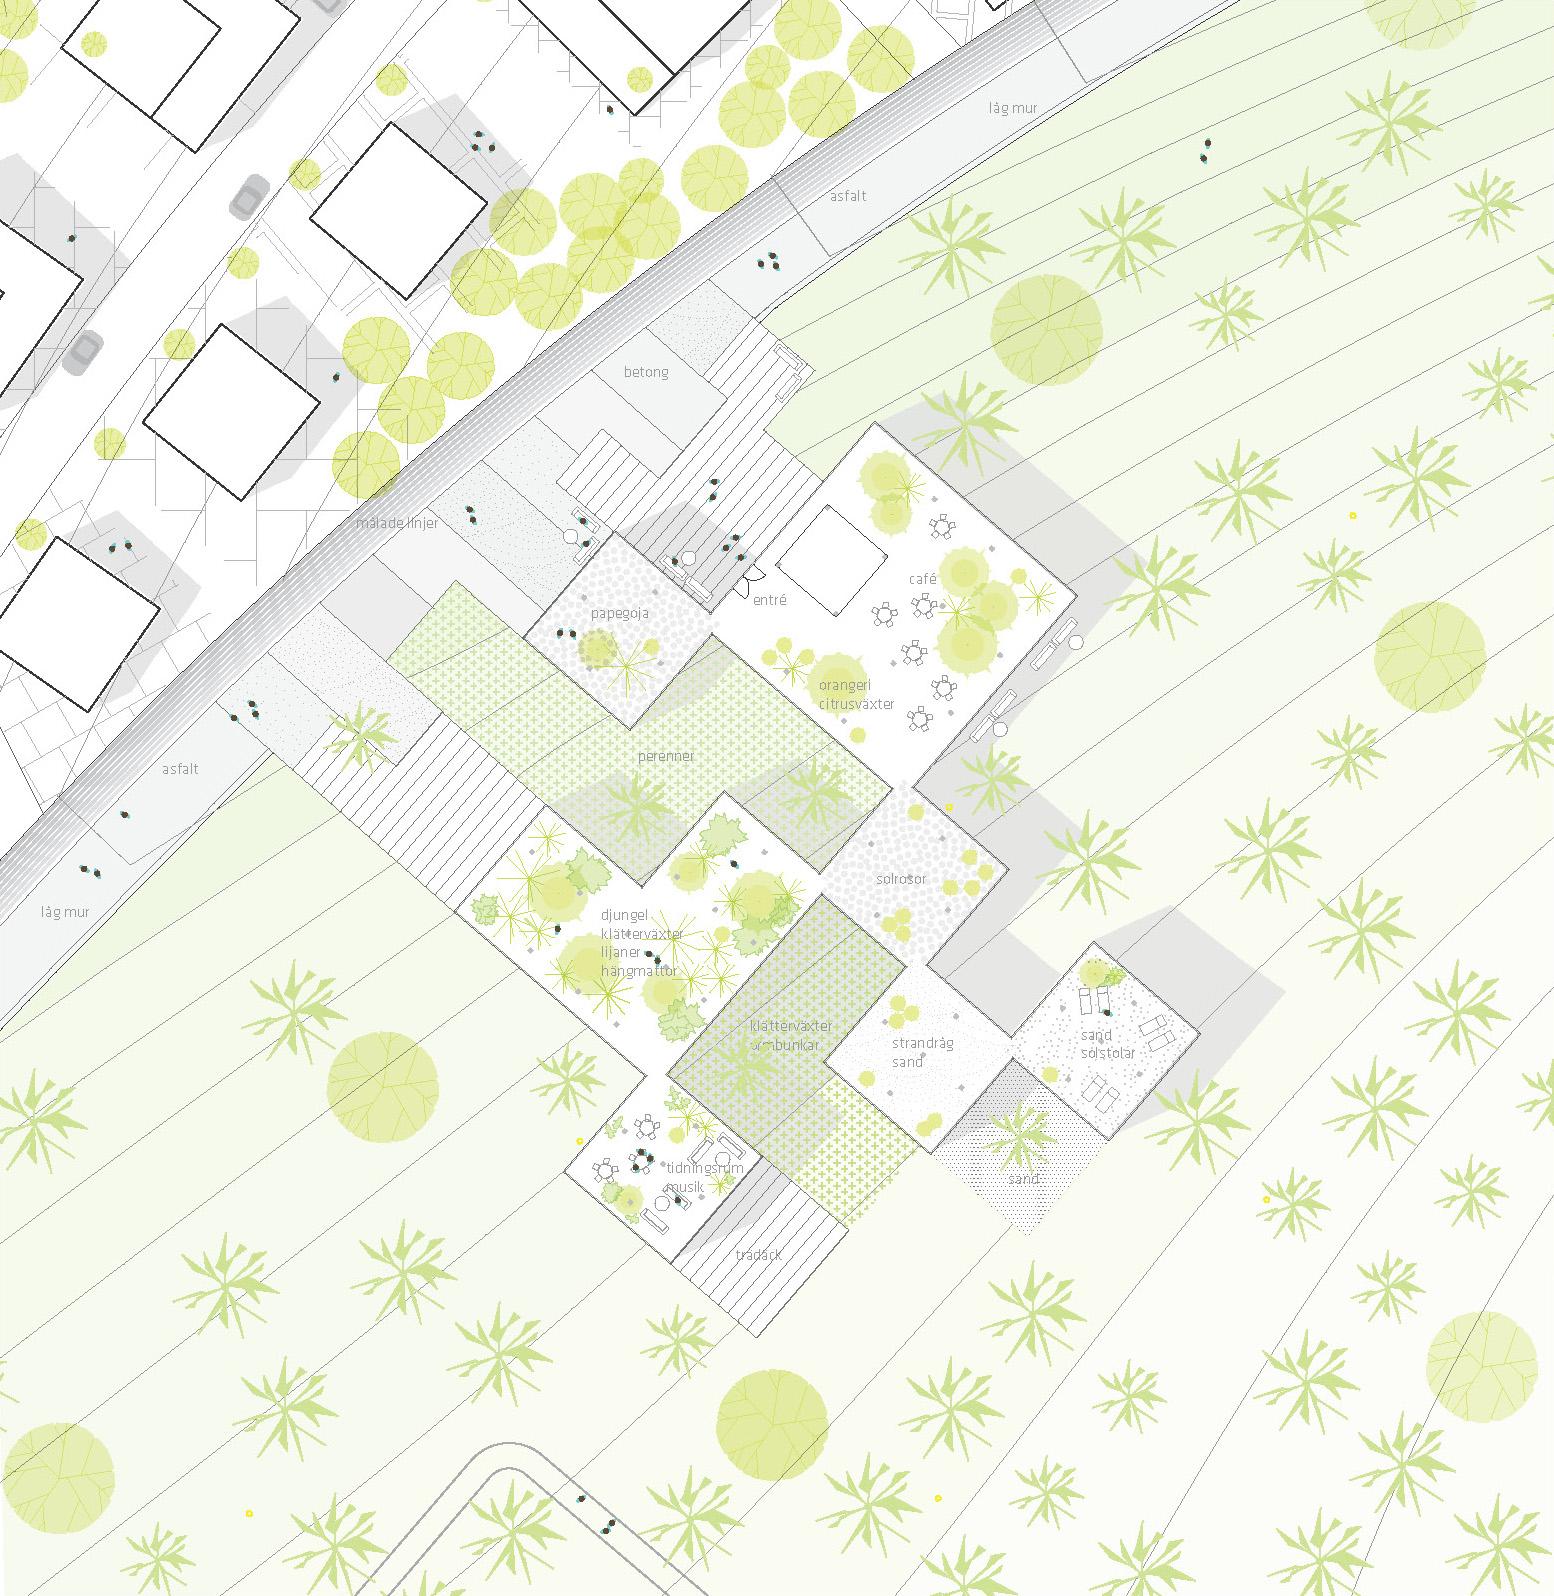 Urban planning: Stockholmsporten master plan